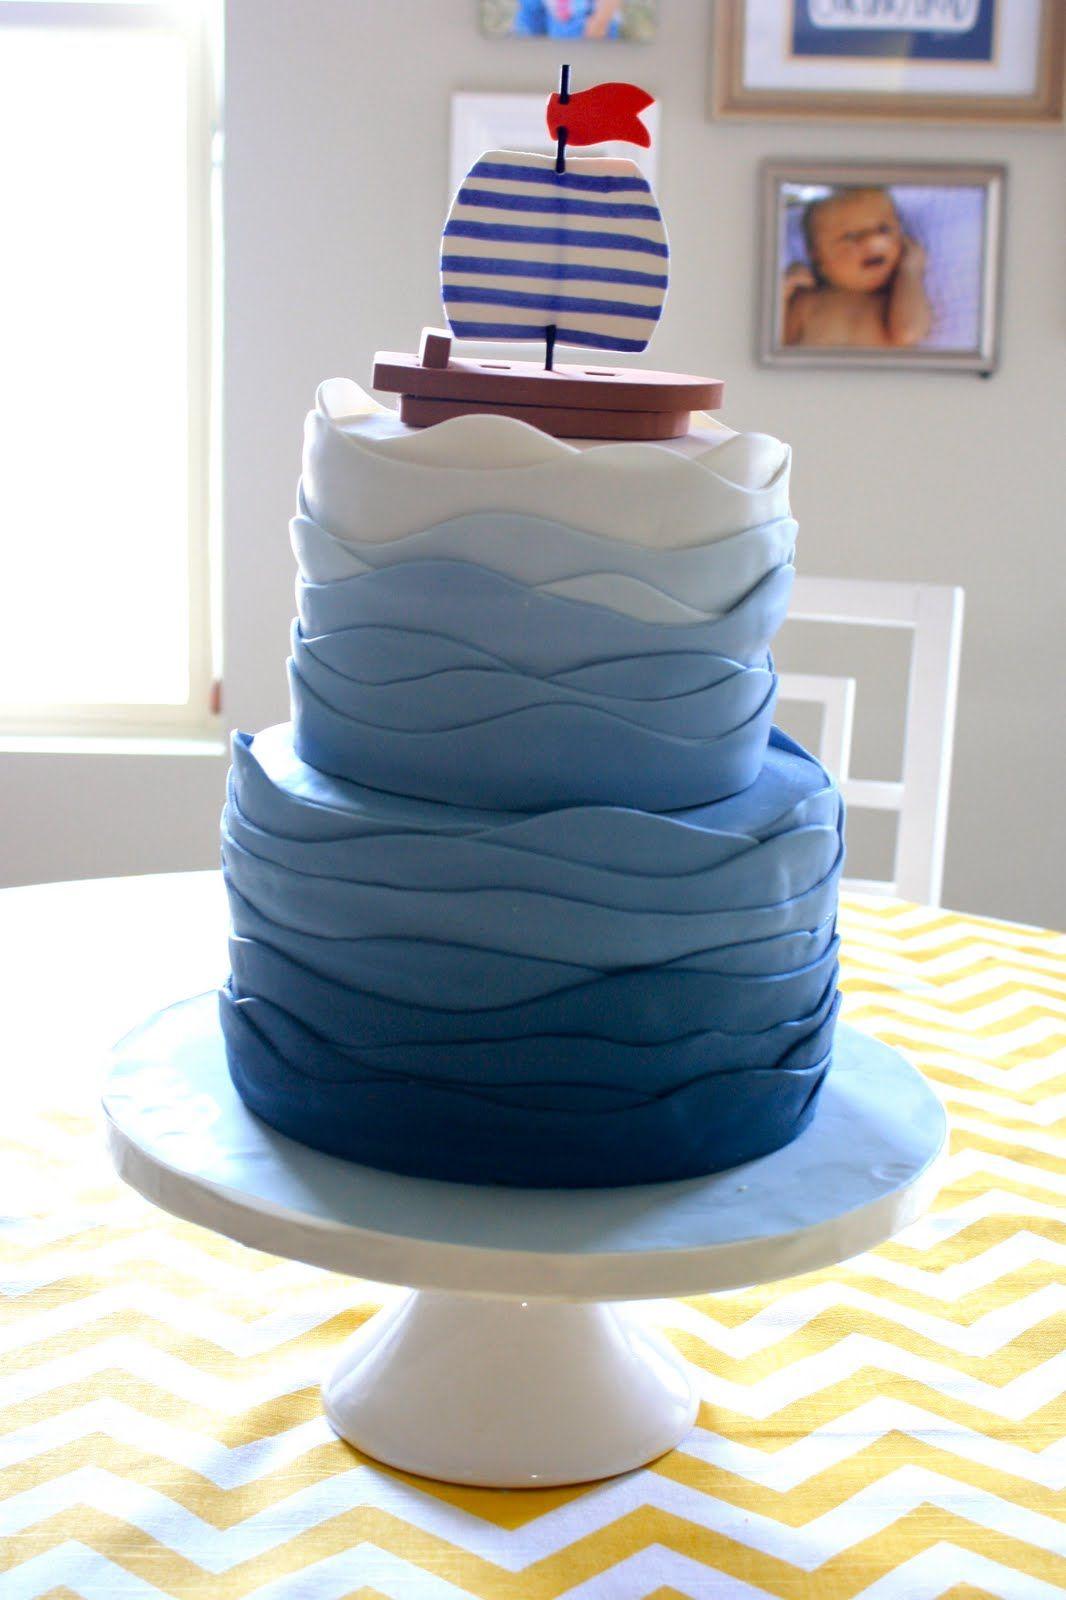 Admirable Jetts Nautical Birthday Party Mit Bildern Bootkuchen Kuchen Funny Birthday Cards Online Sheoxdamsfinfo